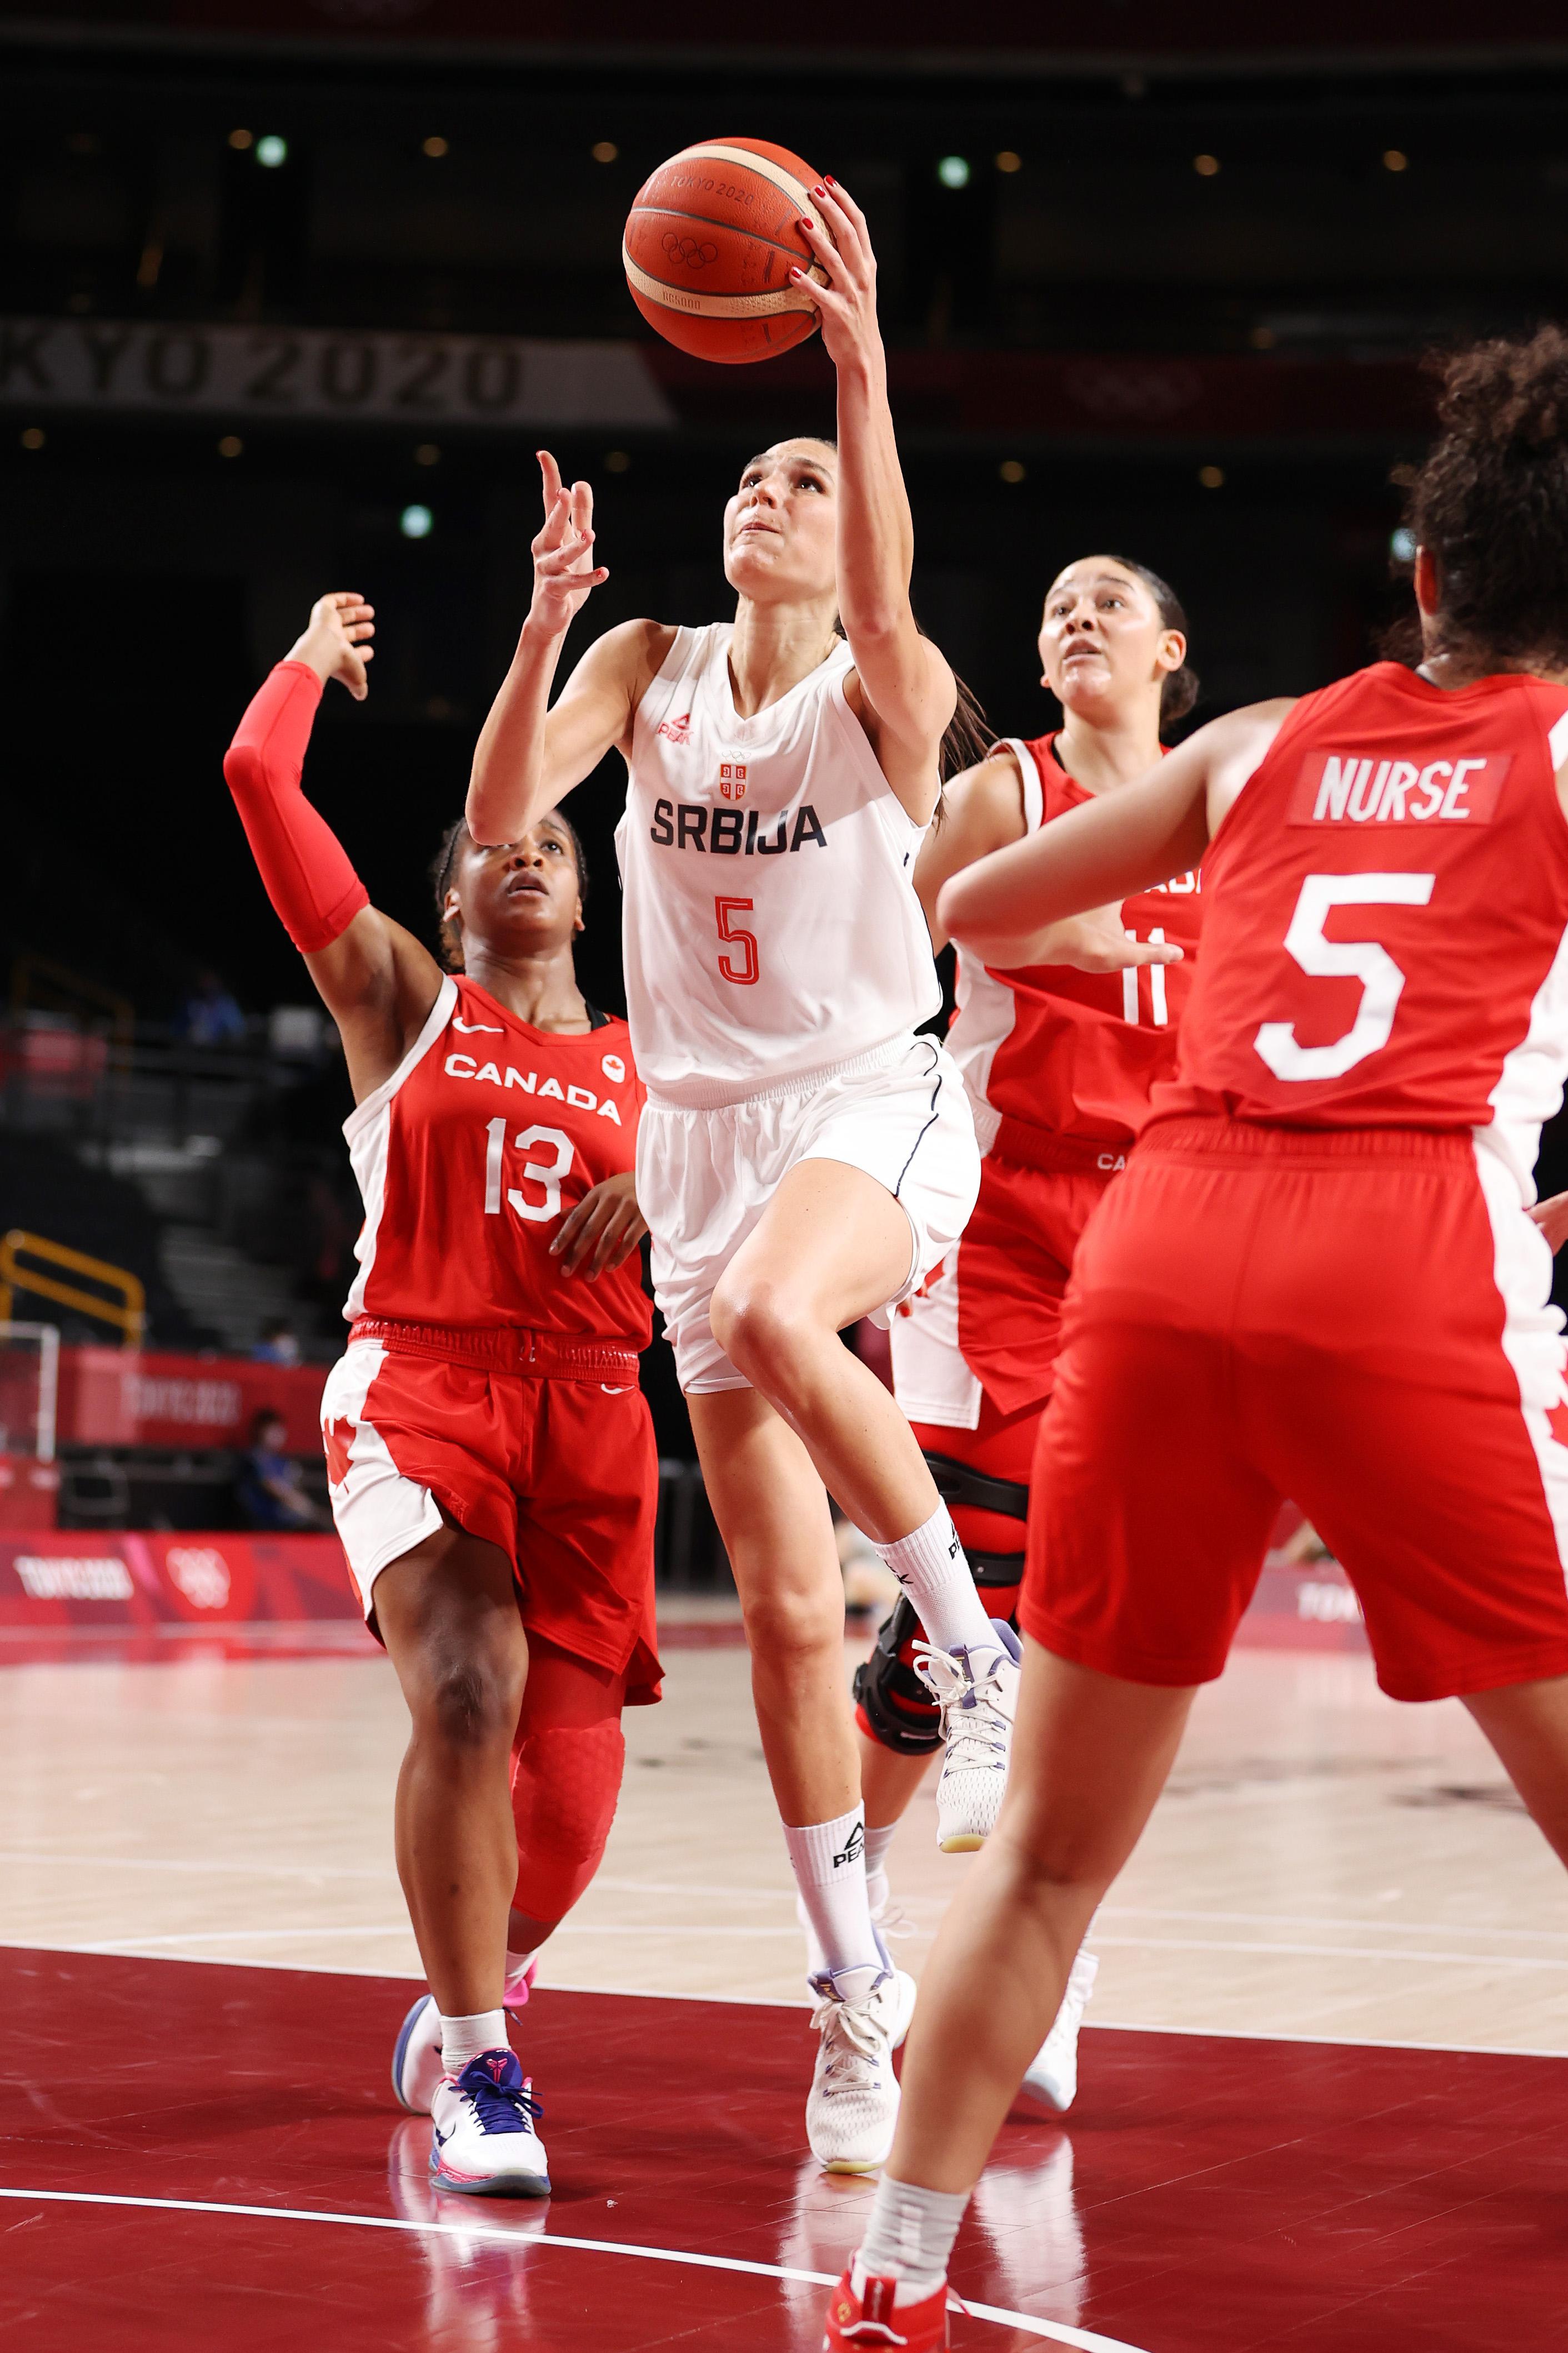 Serbia v Canada Women's Basketball - Olympics: Day 3